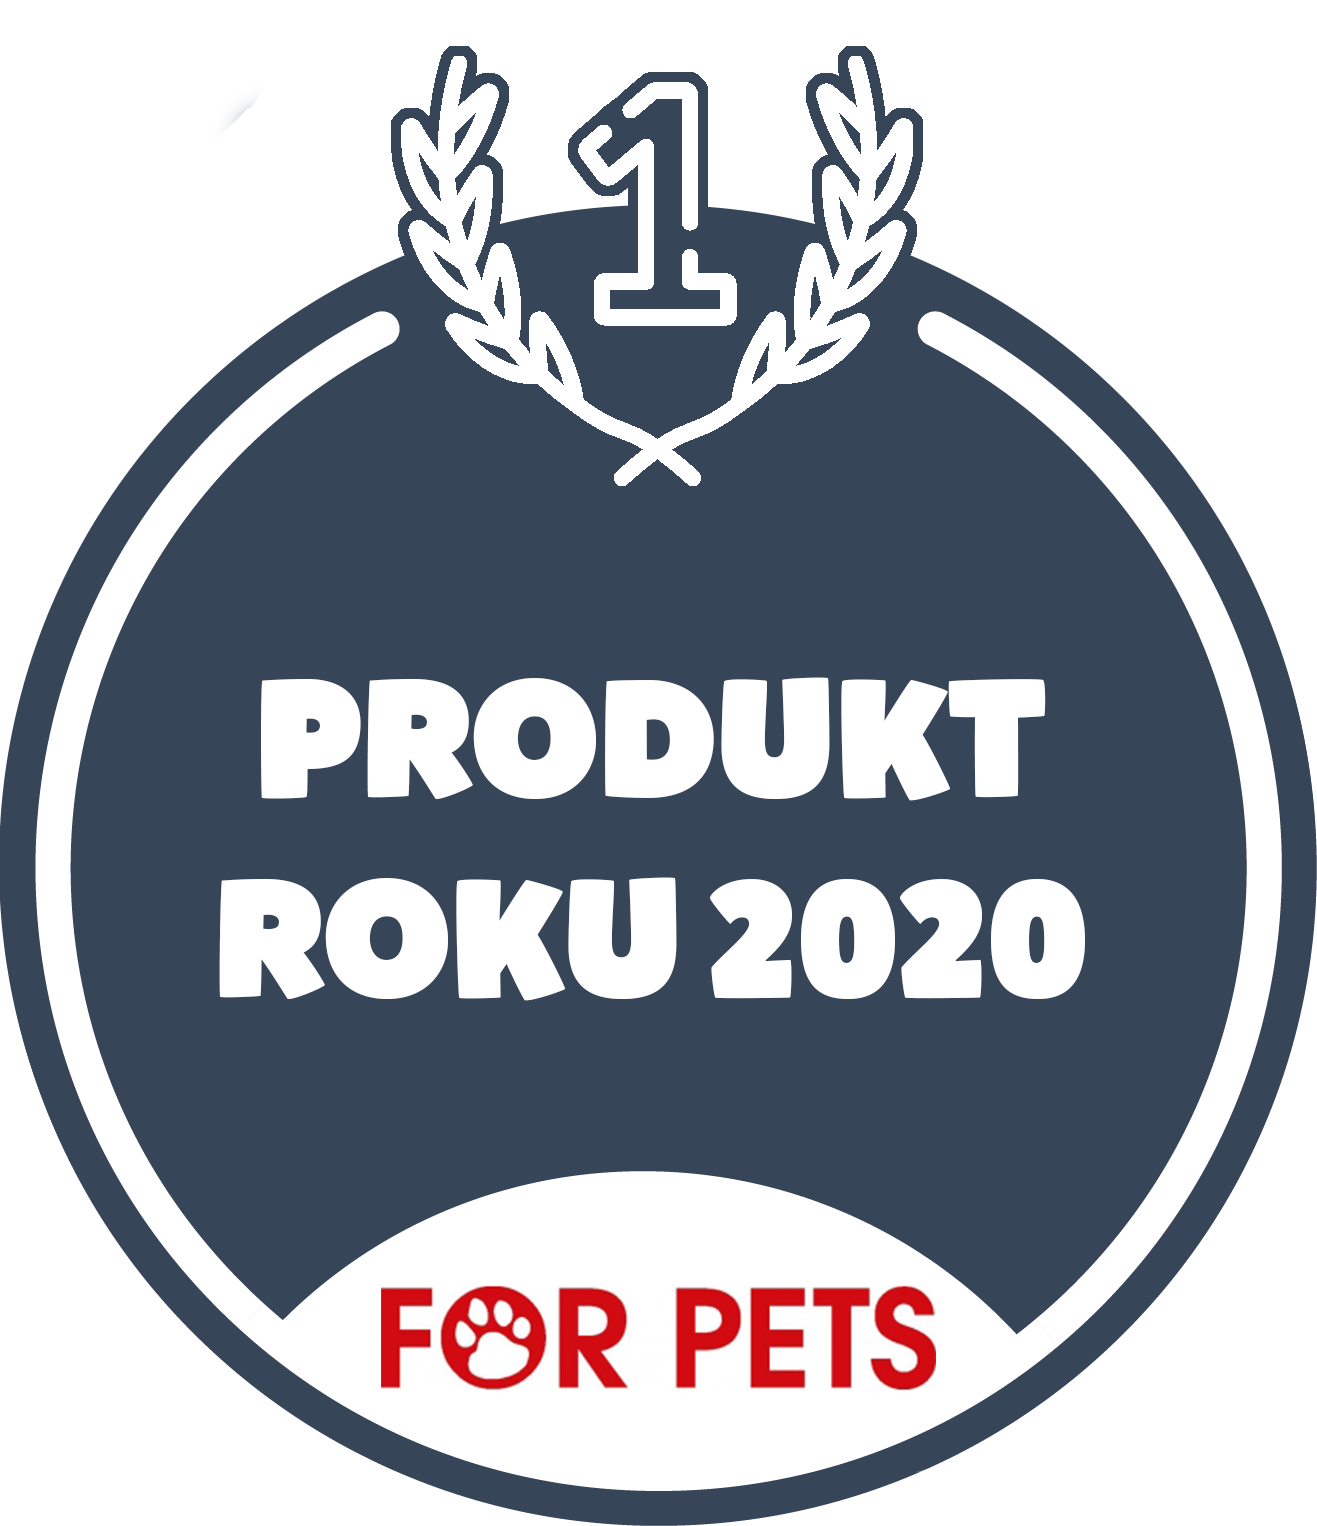 Grand Prix veletrhu FOR PETS 2020